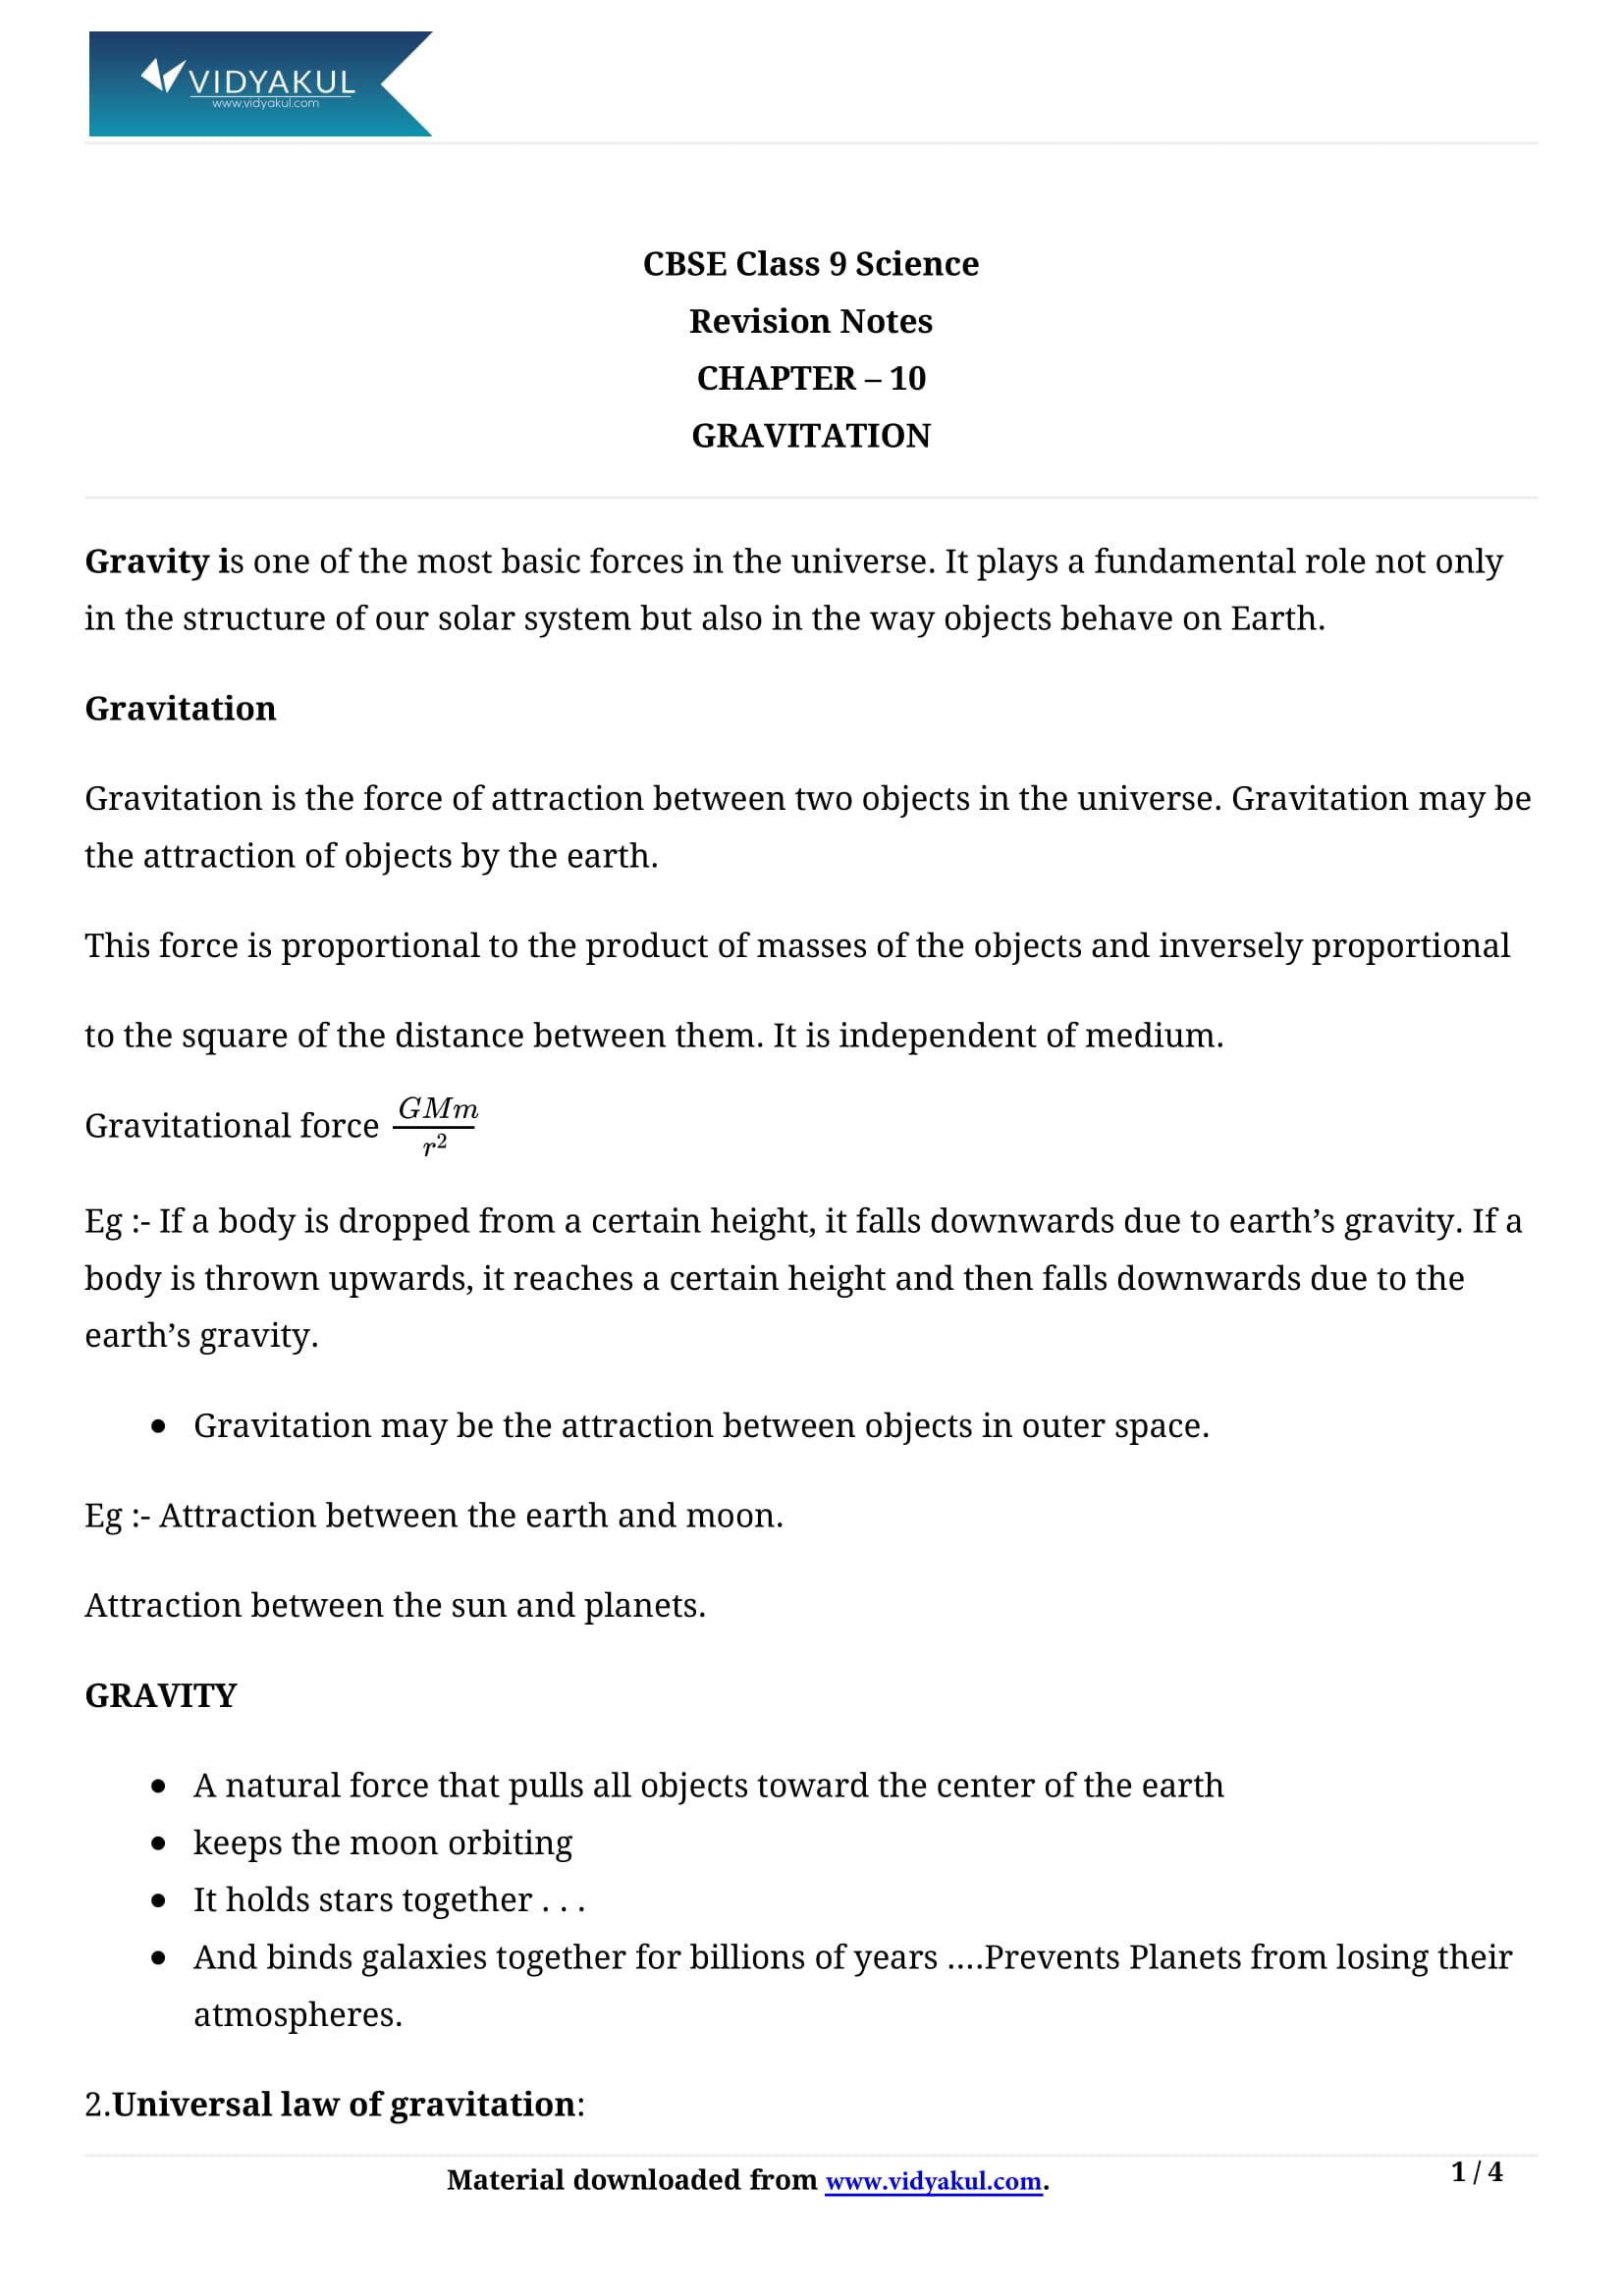 Gravitation Class 9 Notes